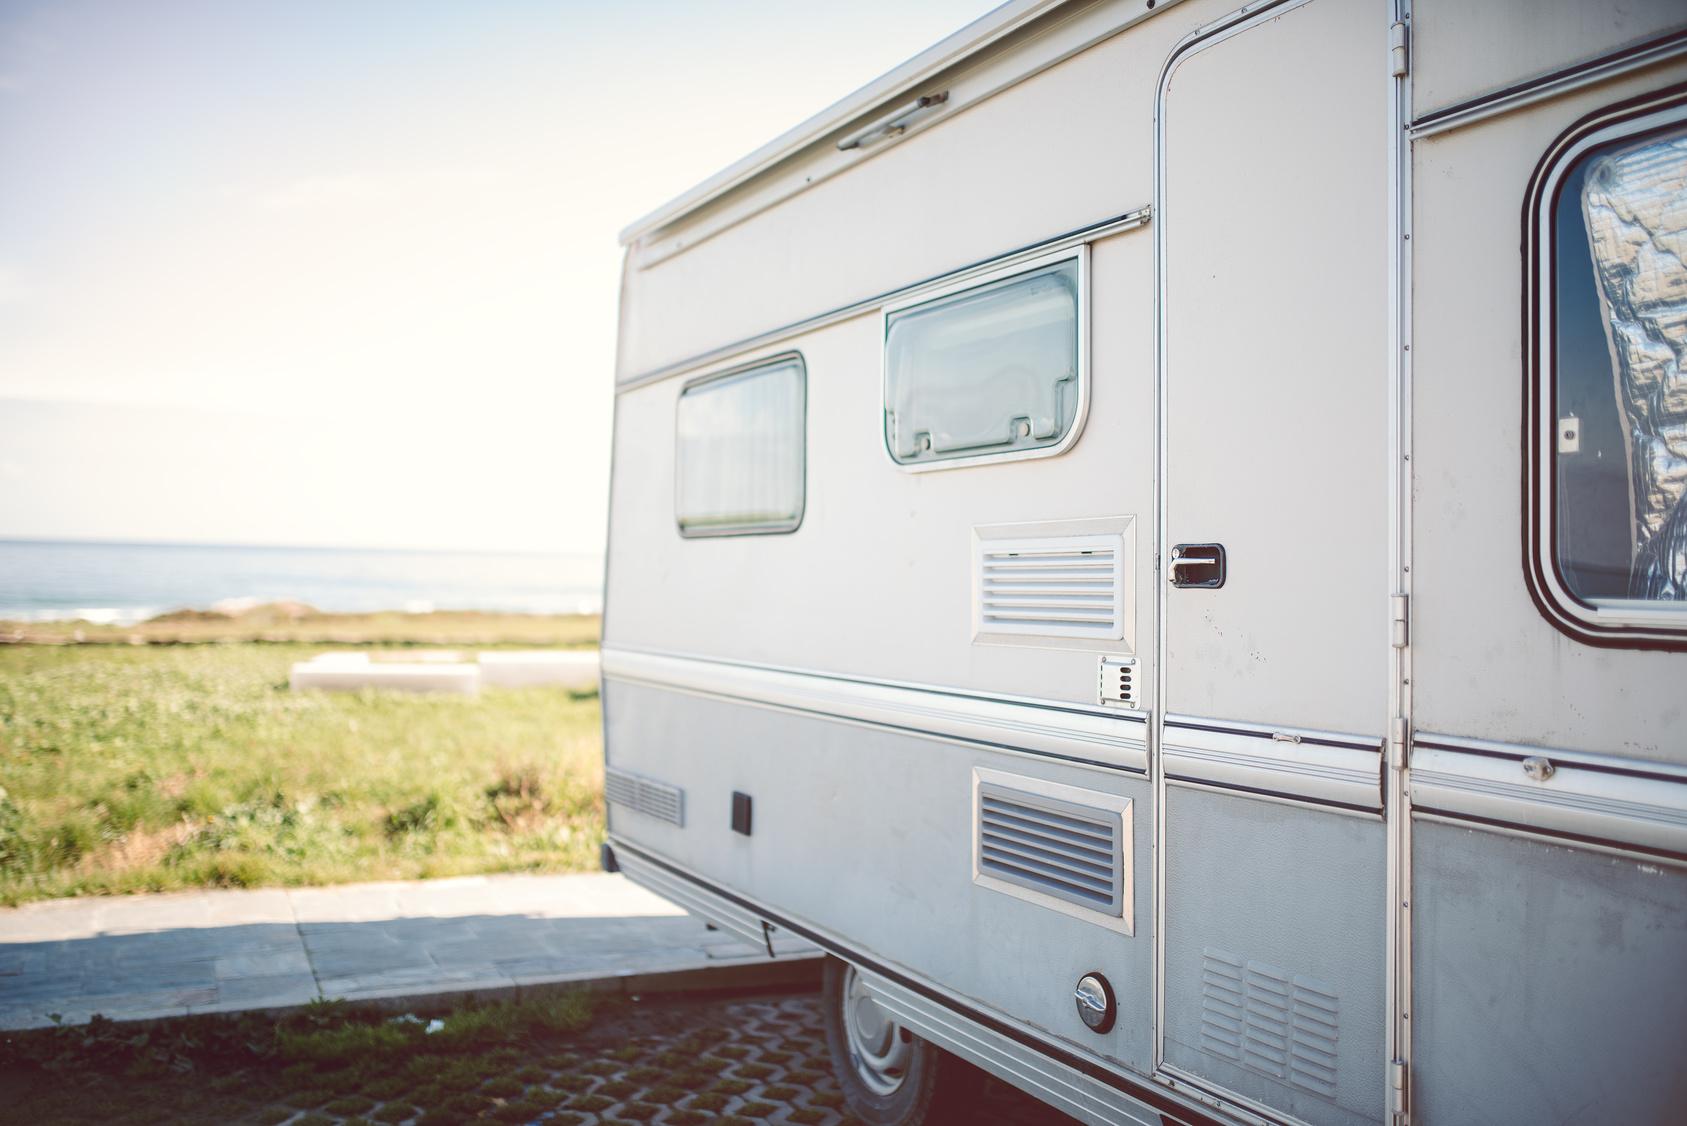 Mit dem Wohnwagen am Strand urlauben© elenaburn - Fotolia.com